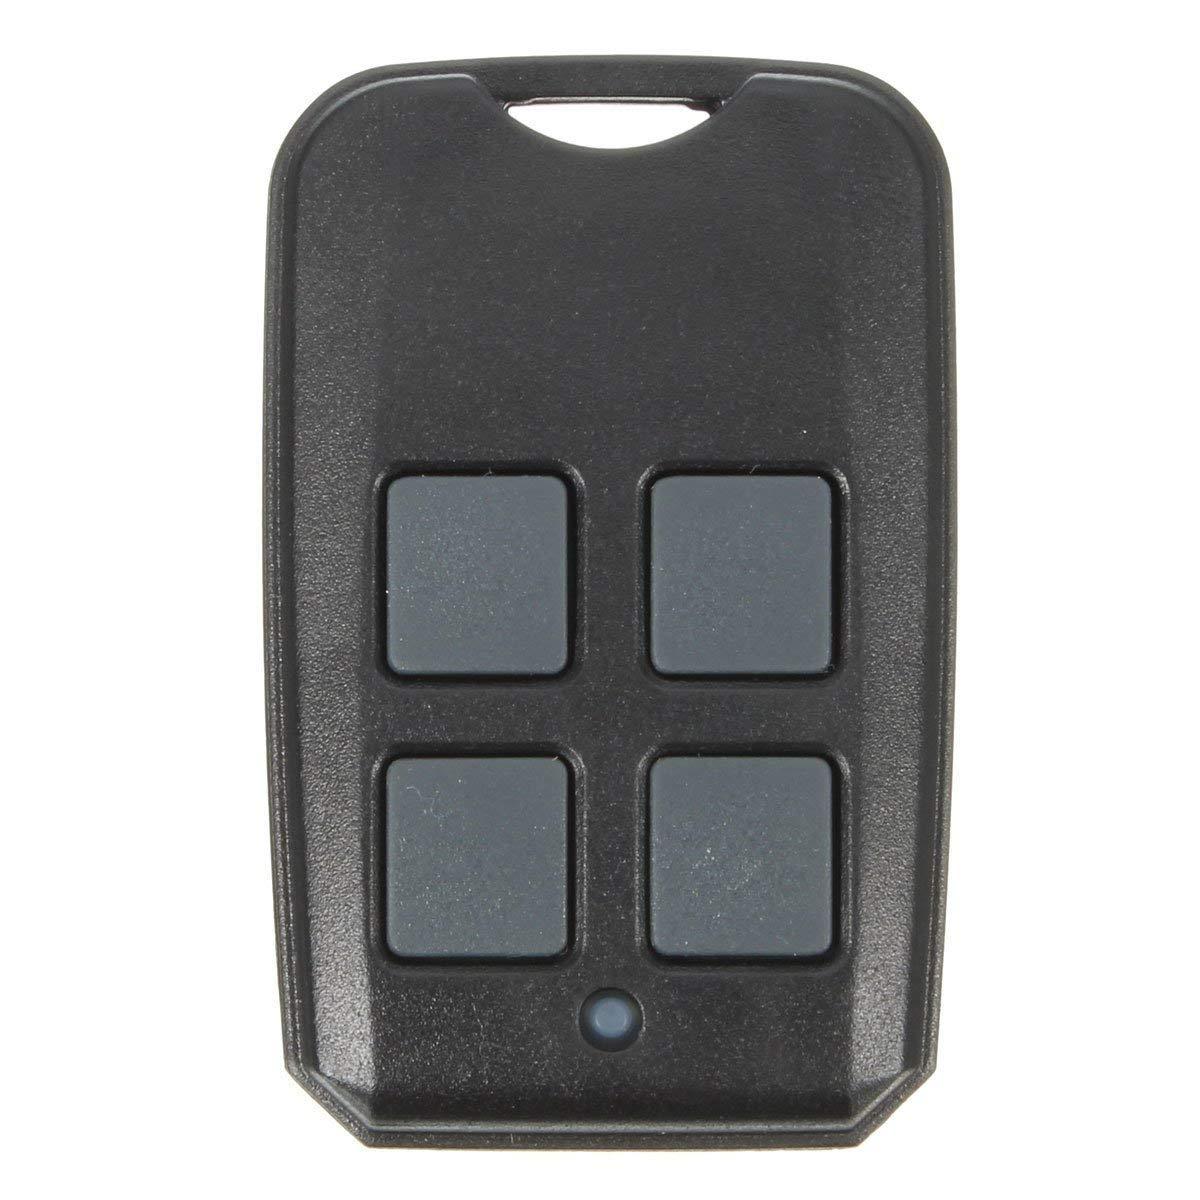 Gate Remote Control - Garage Gate Remote Control - 4 Button 315/390MHz Garage Gate Remote Control For G3T-BX GIC GIT OCDT 37218R (Remote Control For Gate)